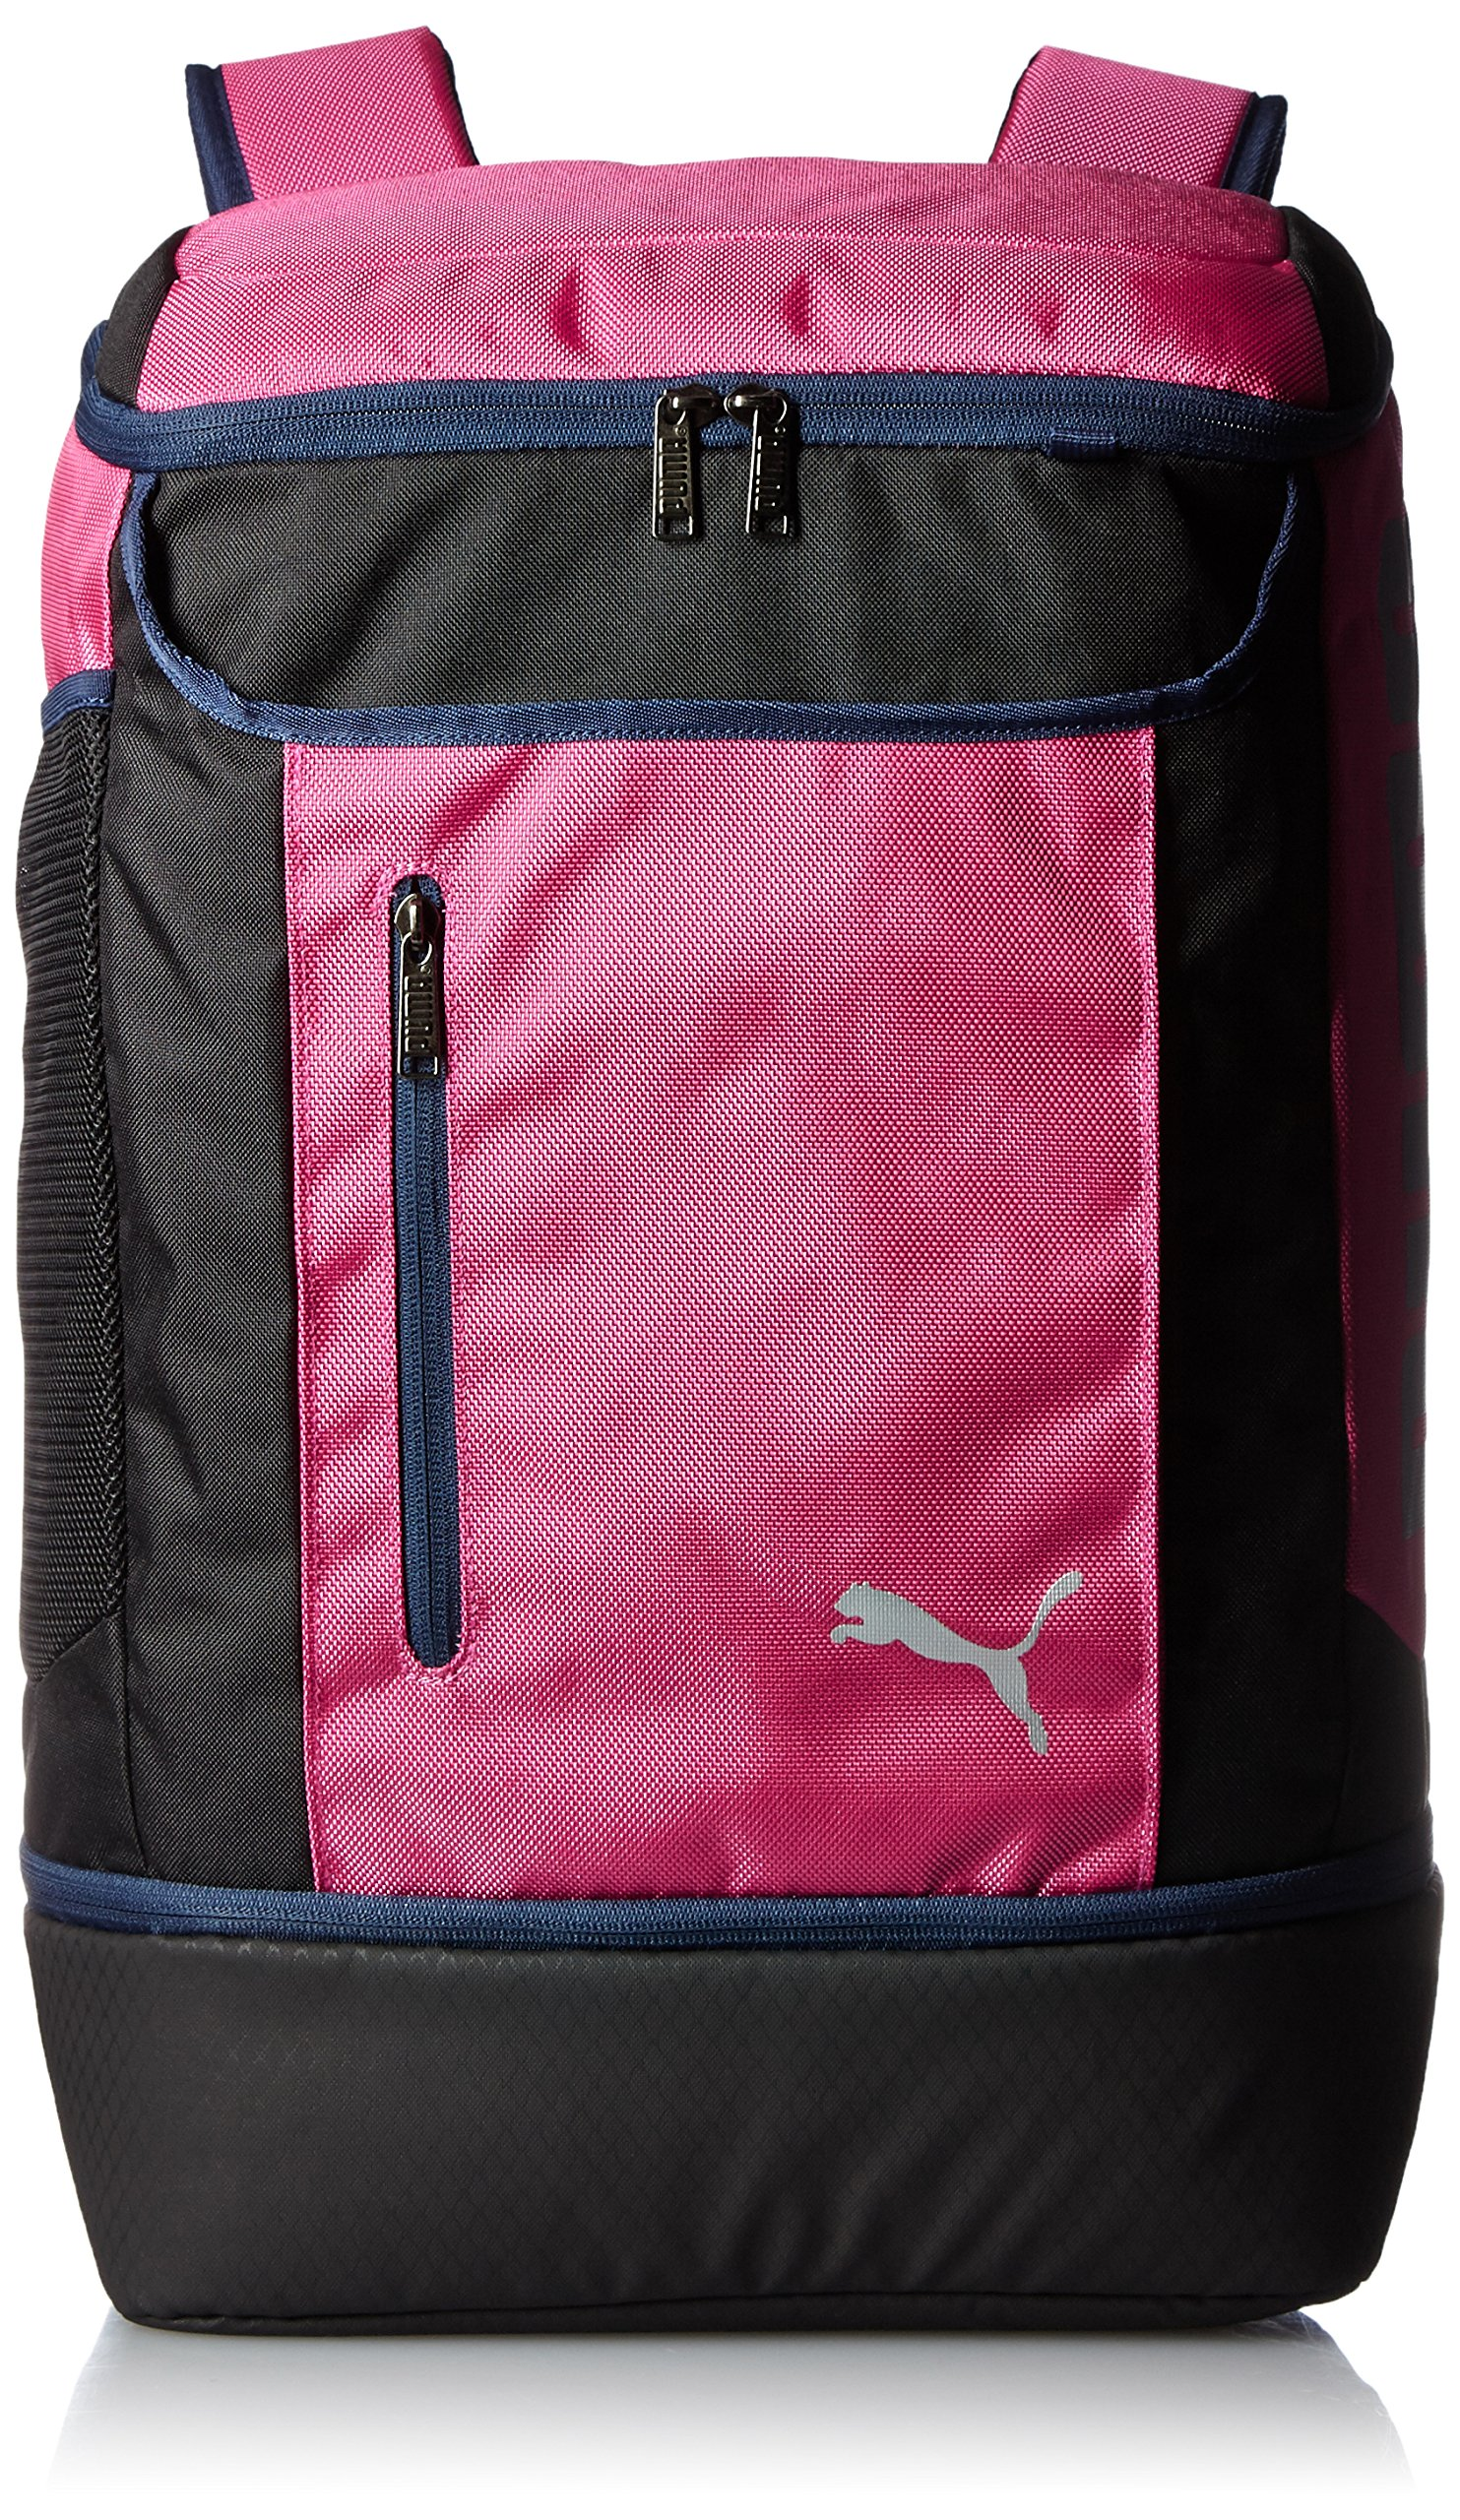 PUMA Backpack Active J SQ Backpack (Fusia Rose/Pea Coat)